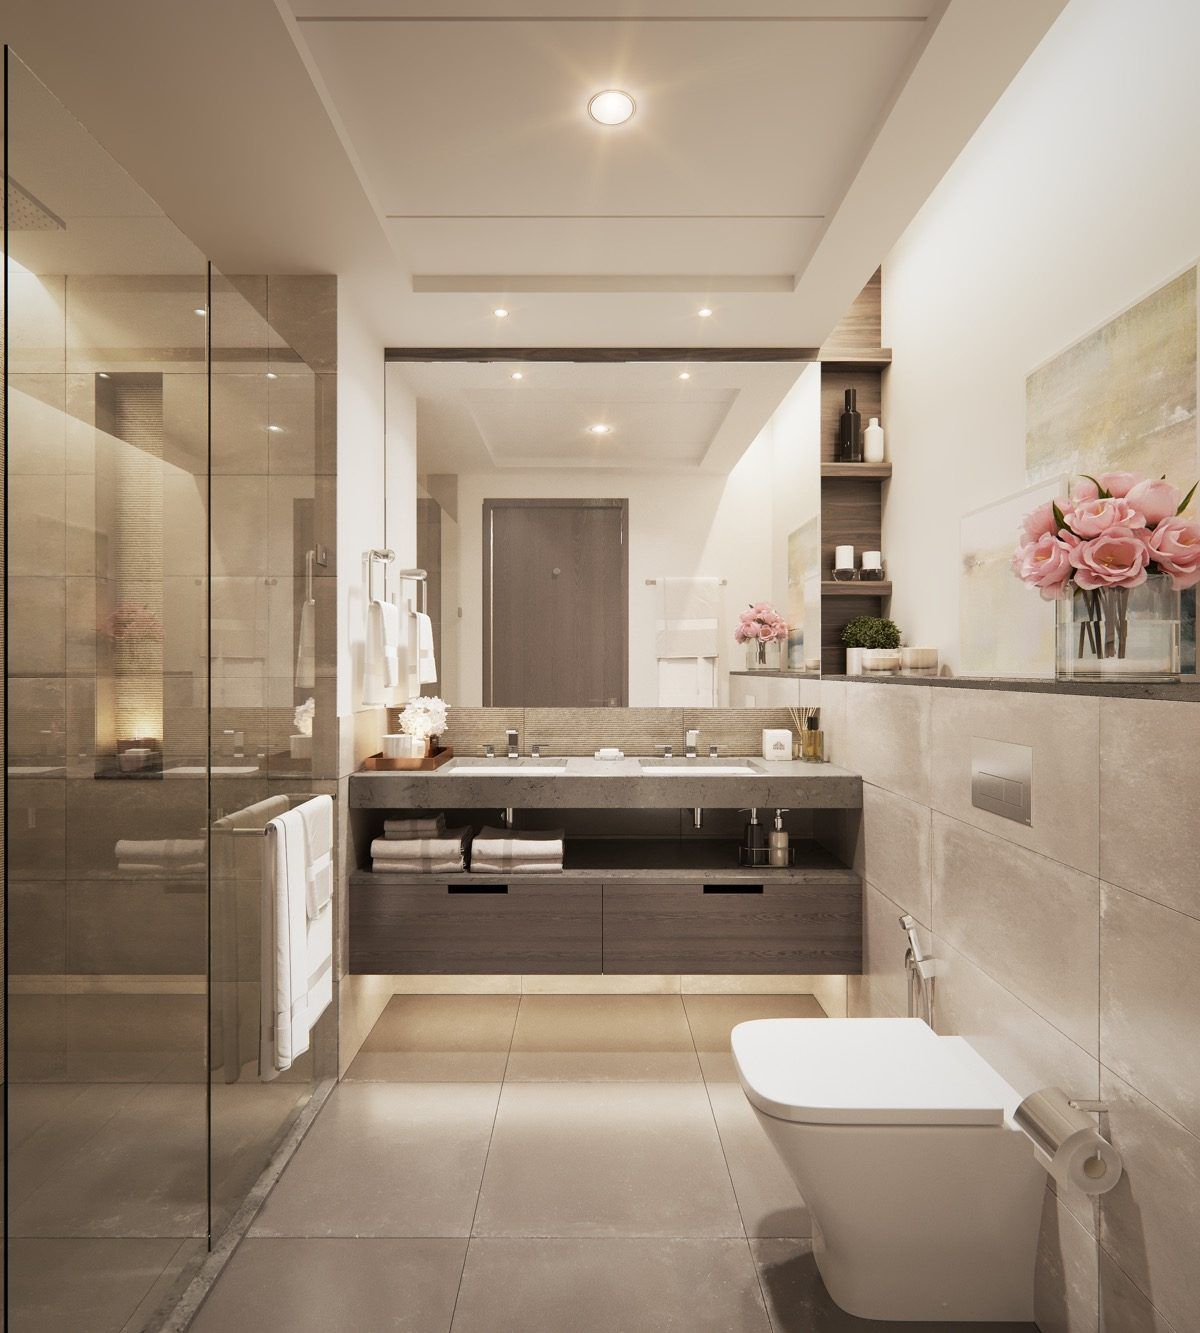 Modern Bathroom In Beige Colors Double Sink Bathroom Bathroom Sink Vanity Double Sink Bathroom Vanity [ 1333 x 1200 Pixel ]